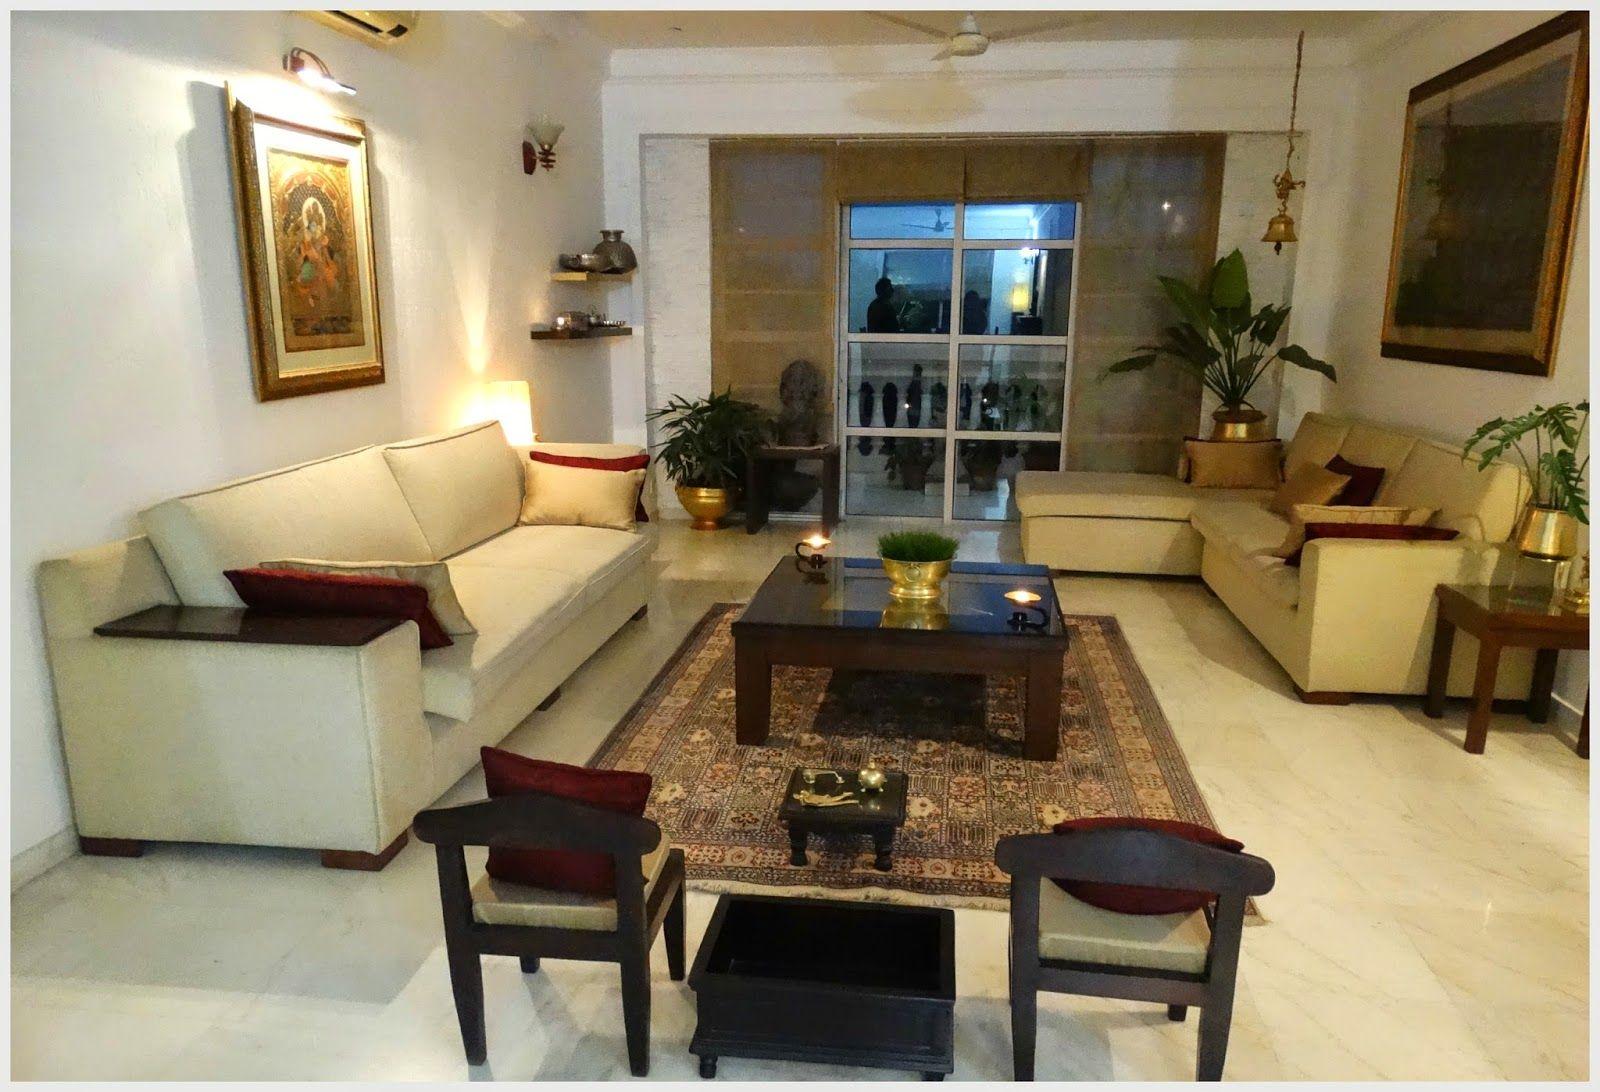 Indian drawing room furniture - Living Room Sofa